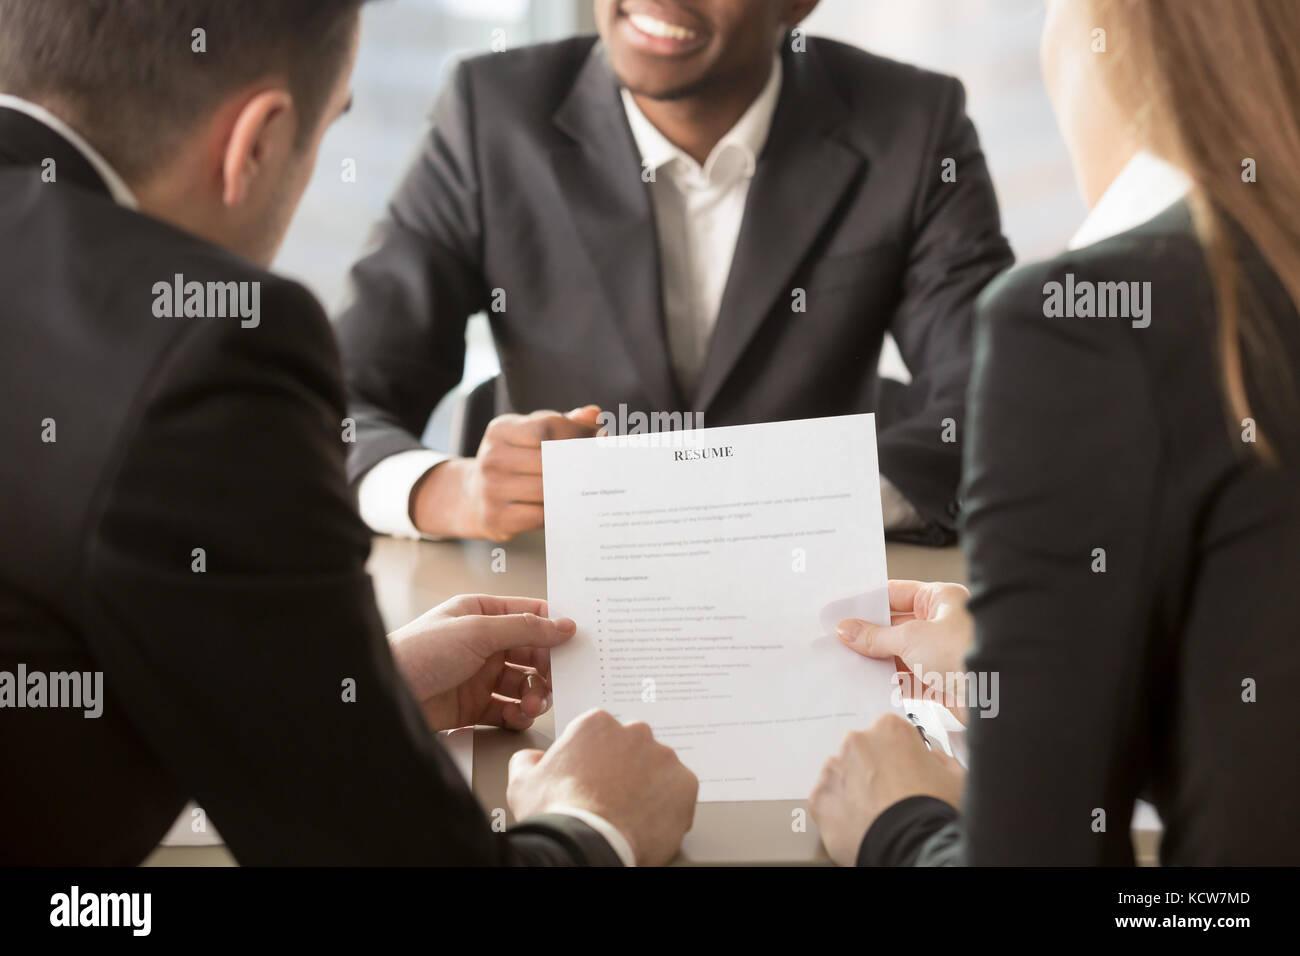 Gerentes de recursos humanos analizando reanudar, pidiendo afro ...